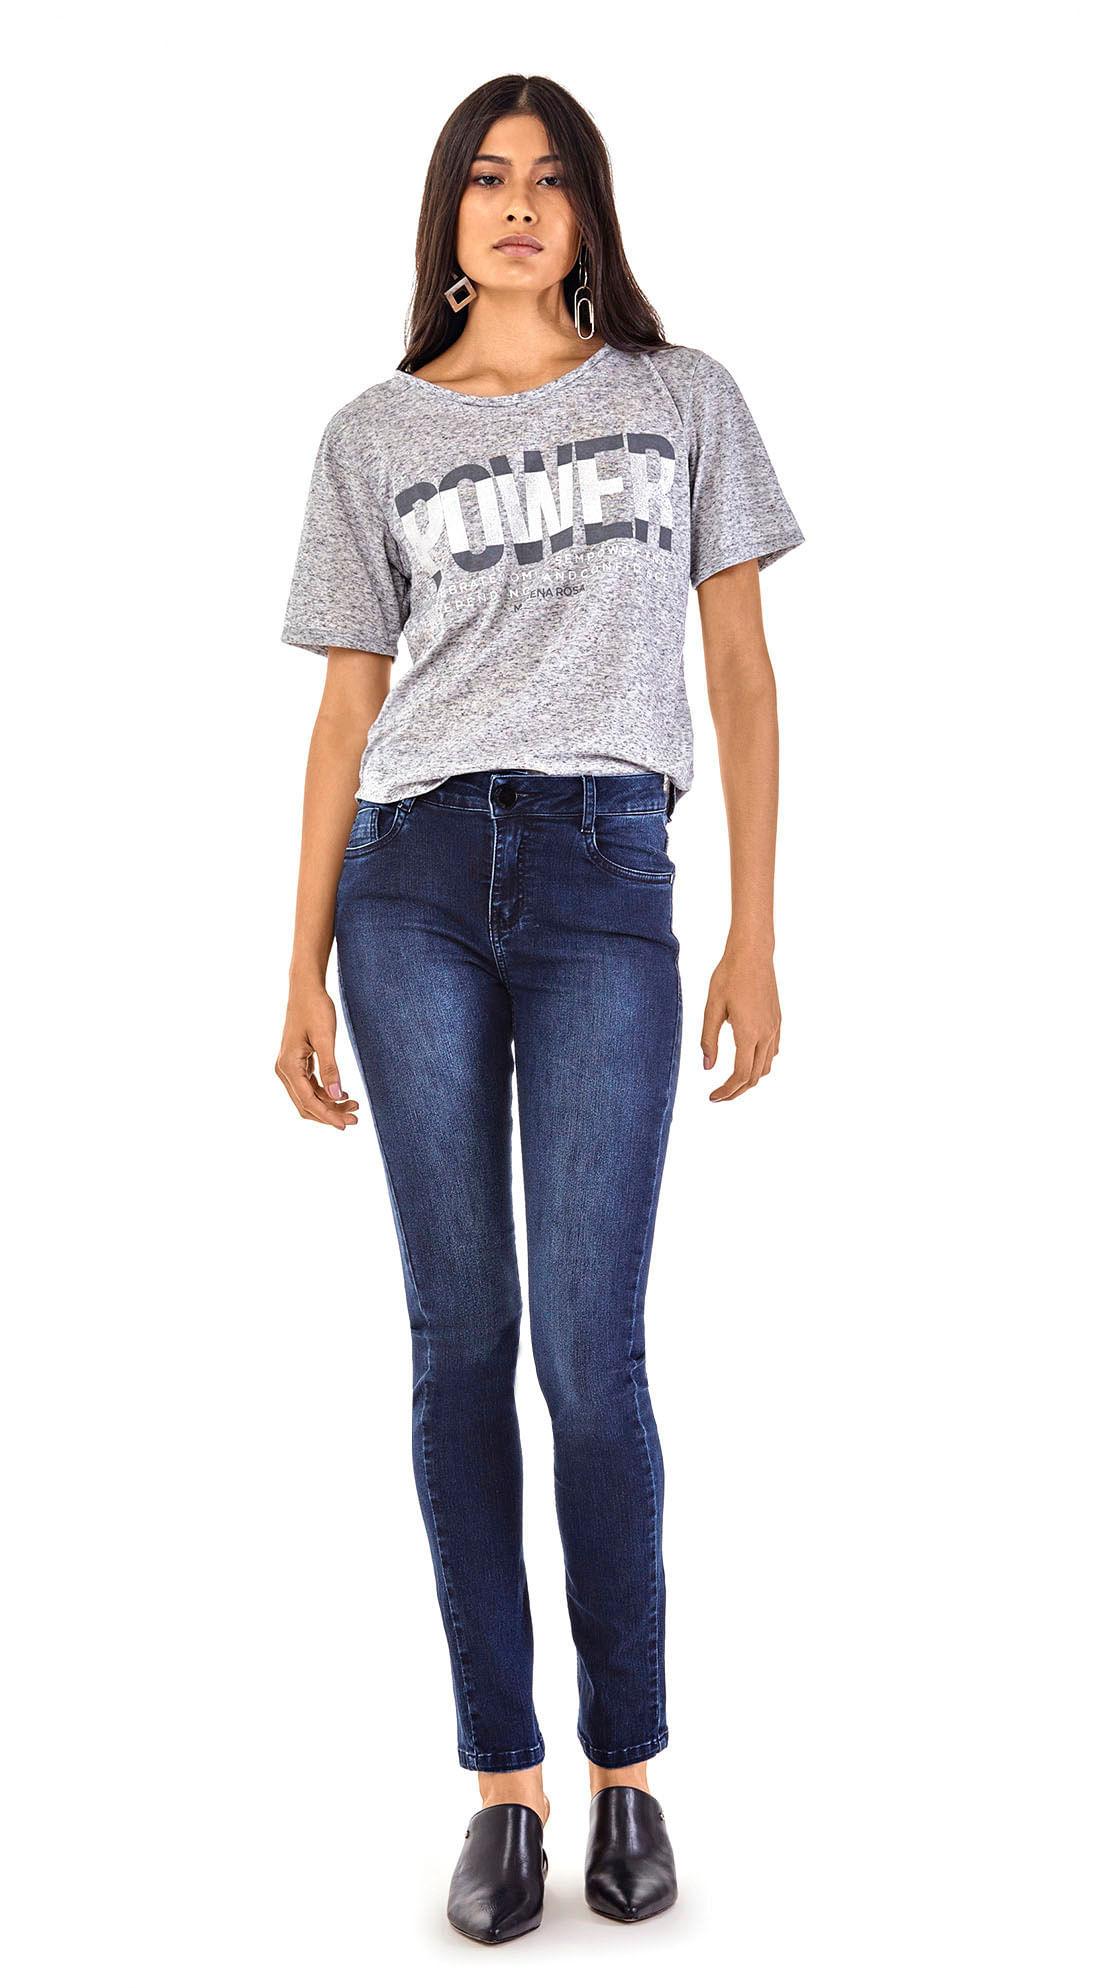 c8037657d Calca Slim Isabelli Cos Alto Escura Jeans - morenarosa